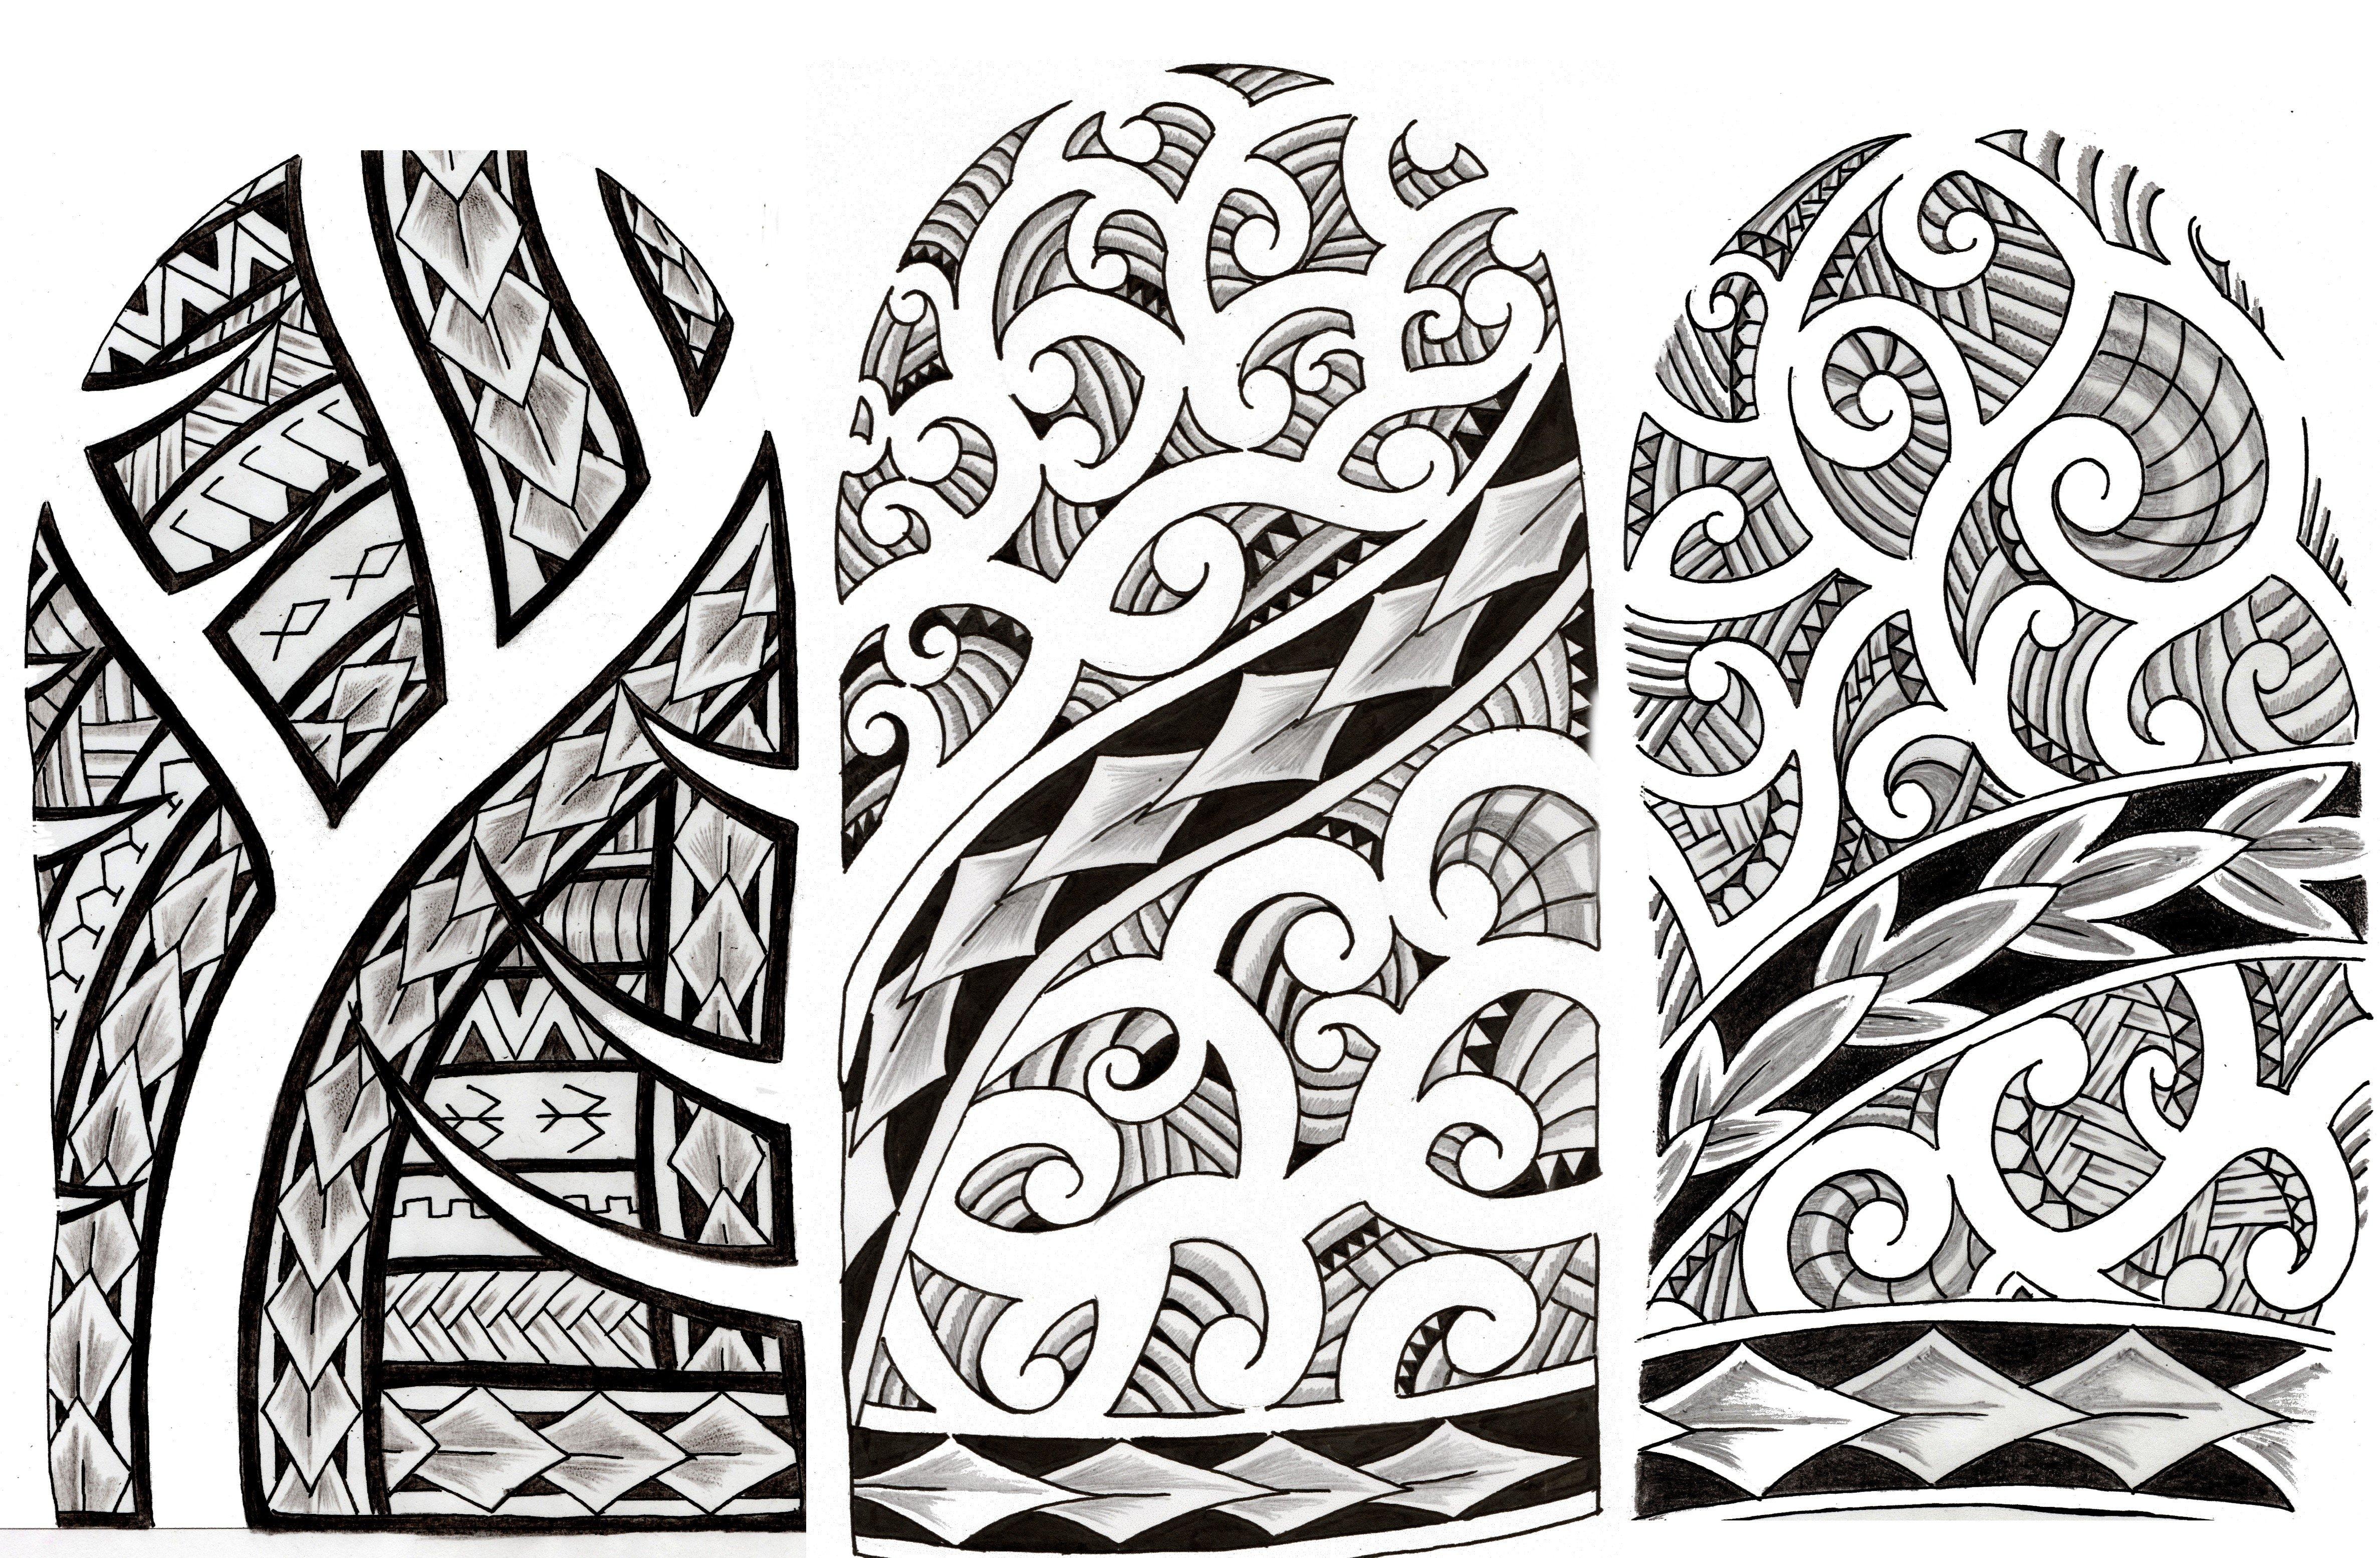 Maori Style Tattoo Designs: Maori Style Designs By Shadow3217 On DeviantArt